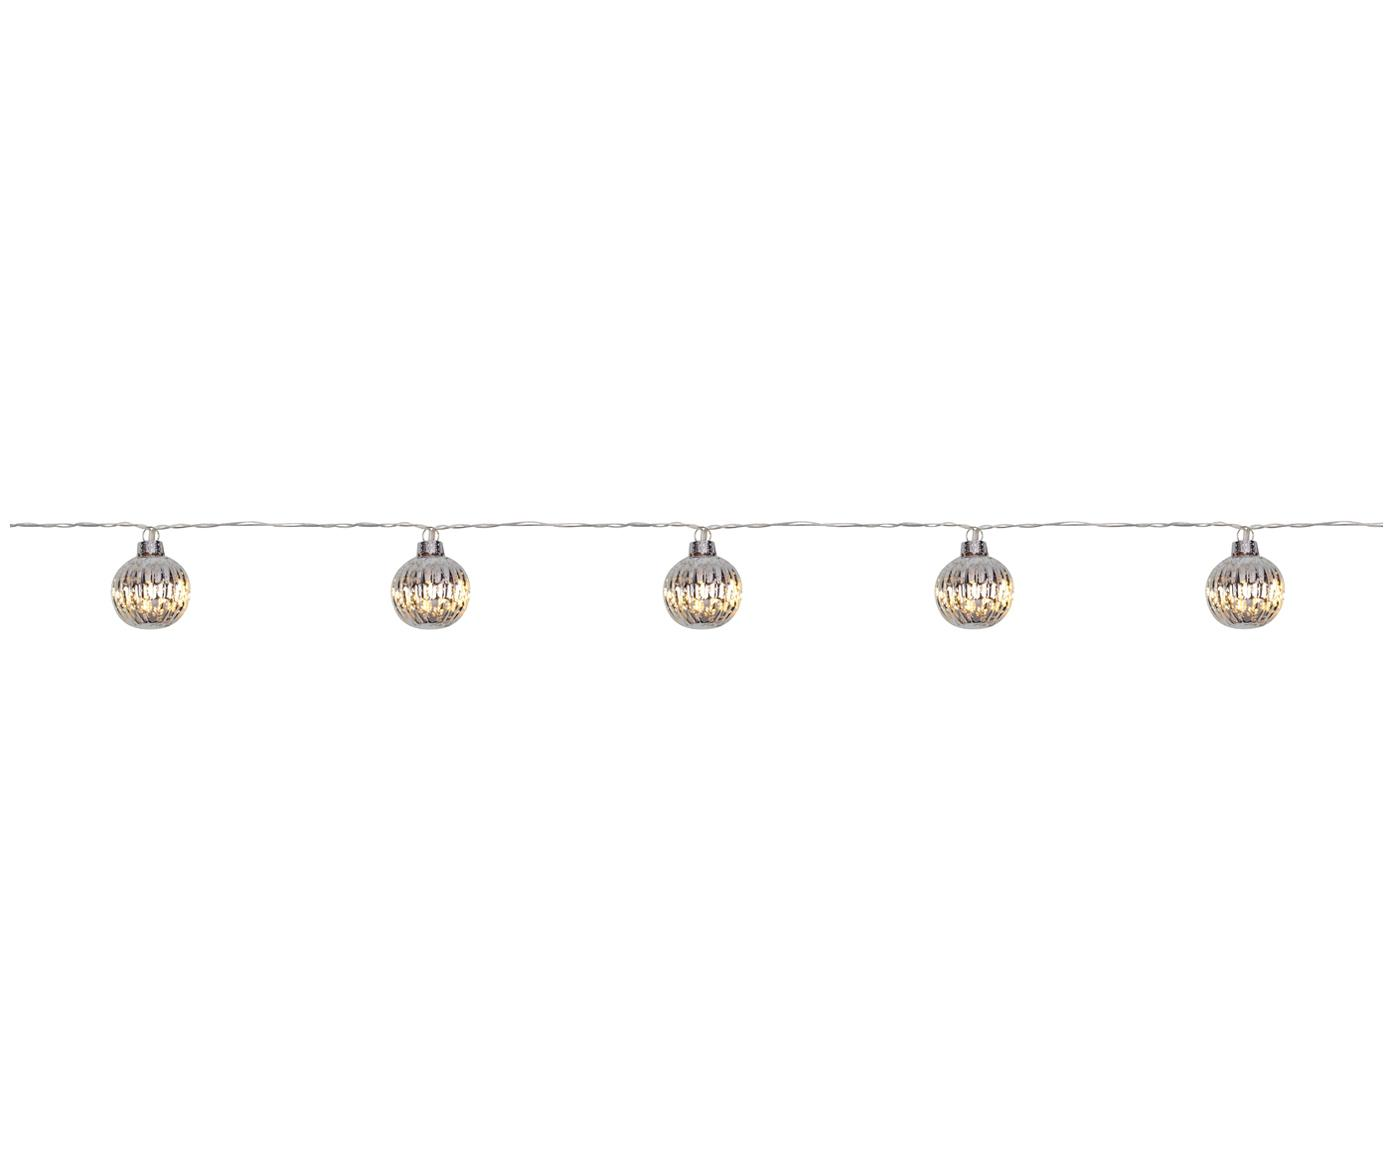 LED lichtslinger Solo, Zilverkleurig, L 170 x H 4 cm